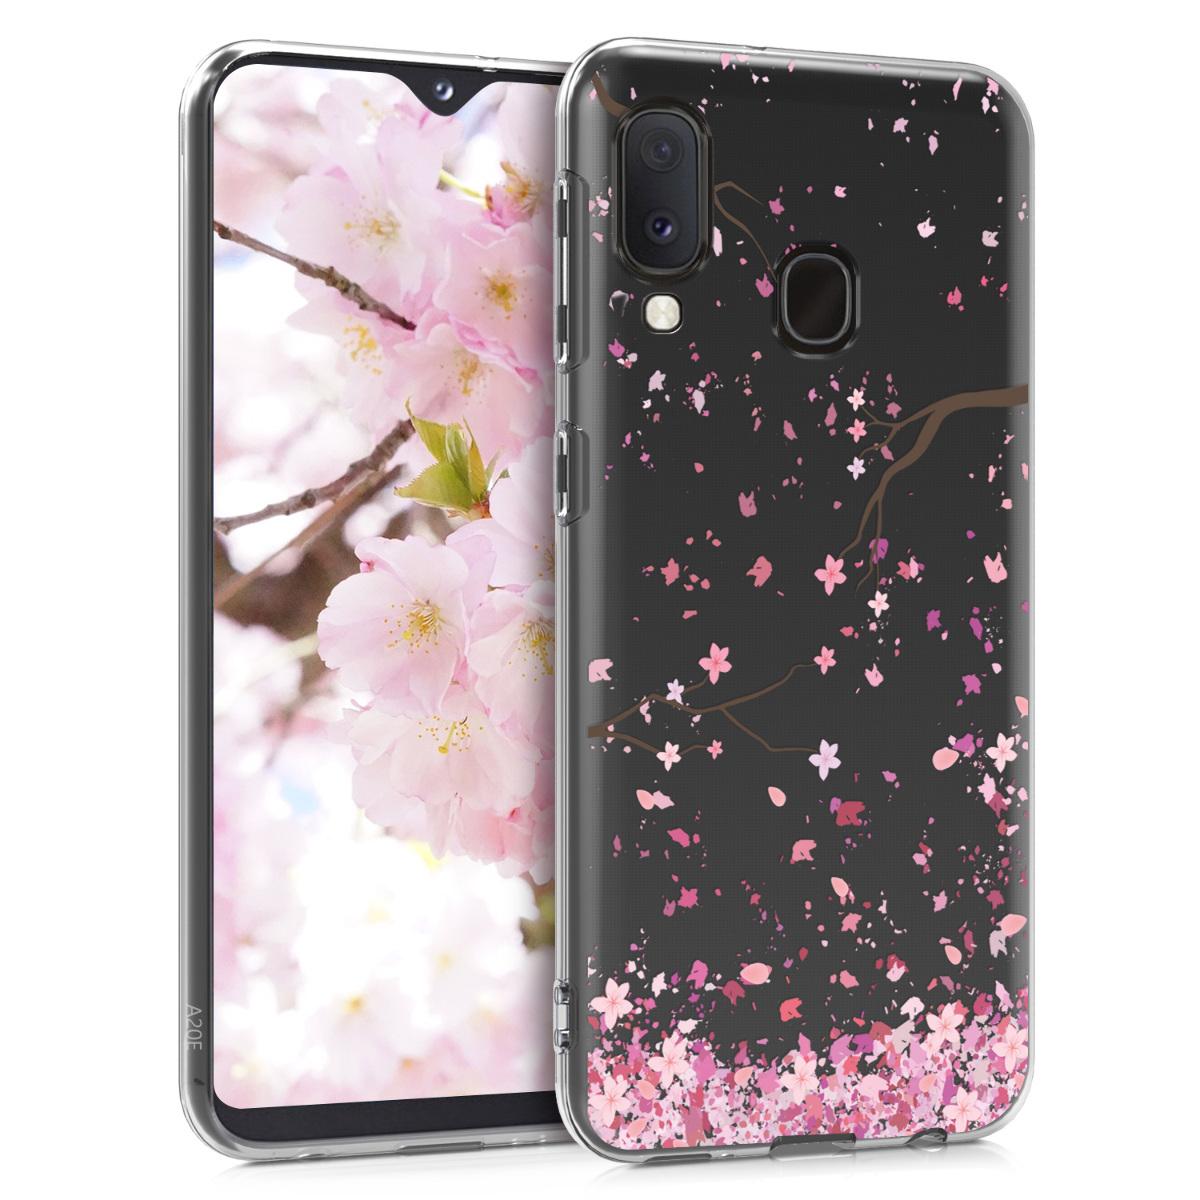 KW Θήκη Σιλικόνης Samsung Galaxy A20e - Crystal Clear - Light Pink / Dark Brown / Transparent (48743.06)